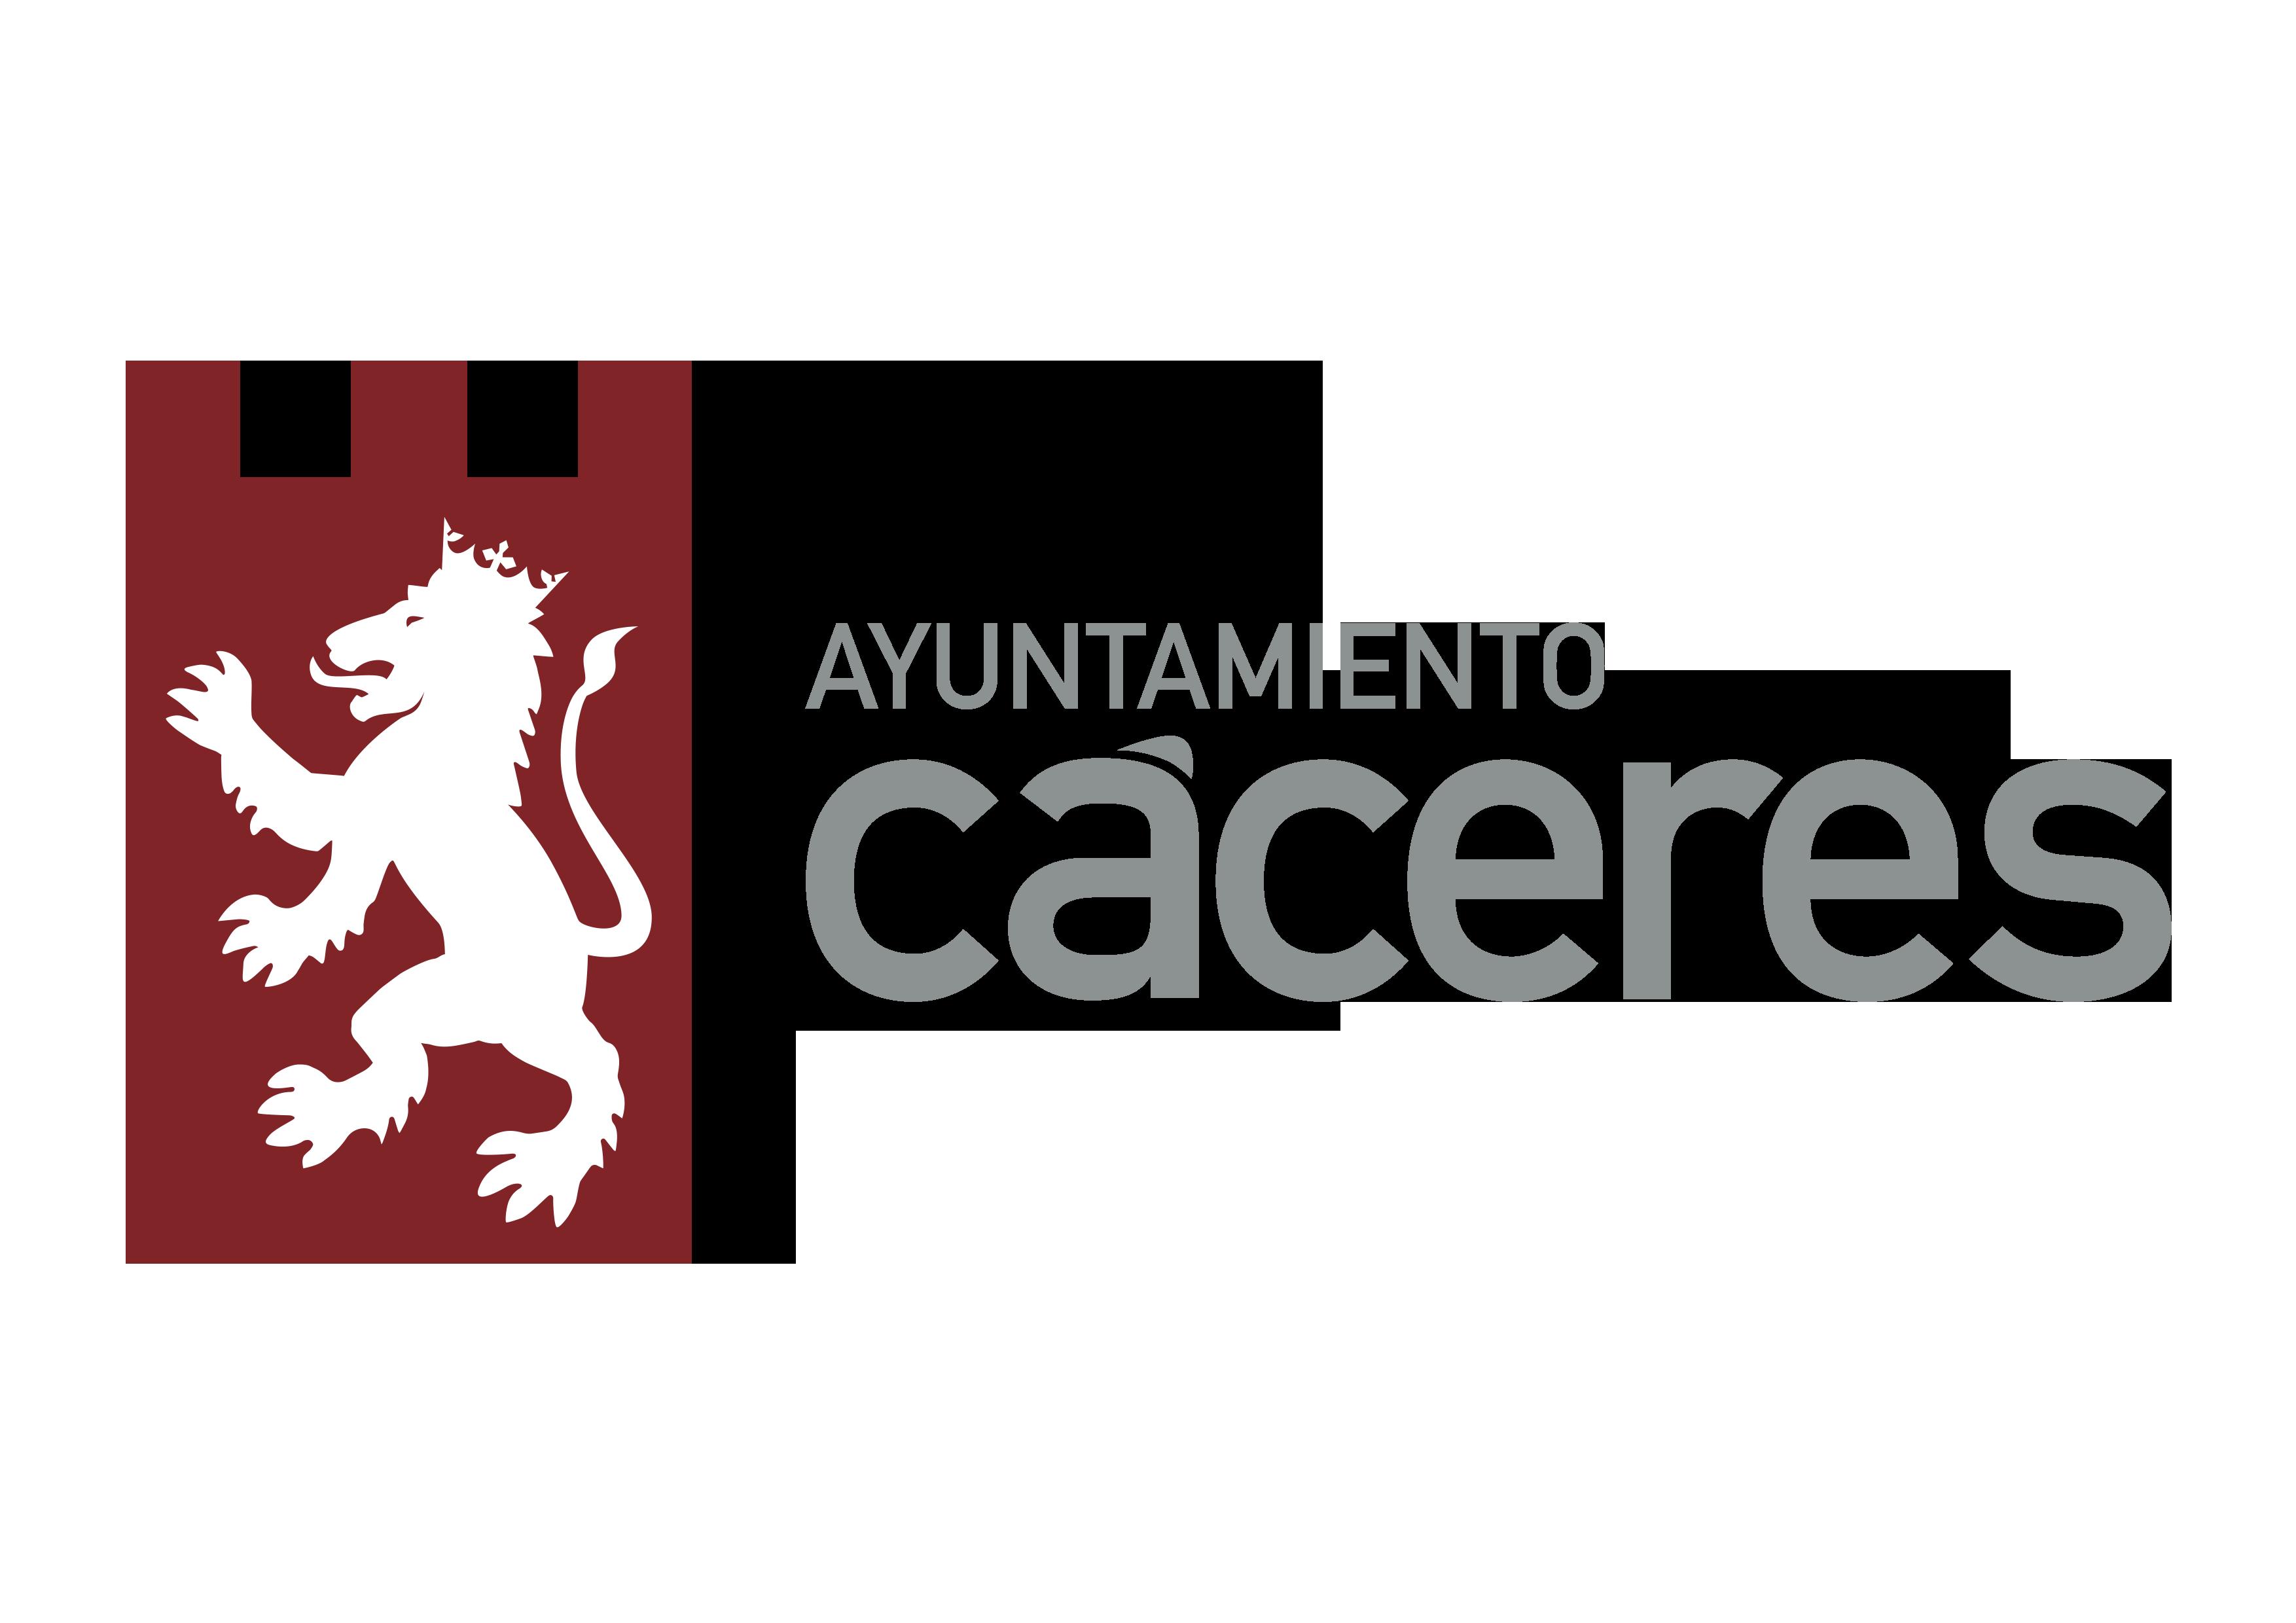 https://2018.extremaduradigitalday.com/wp-content/uploads/2018/09/LOGO-Ayto-Caceres.png